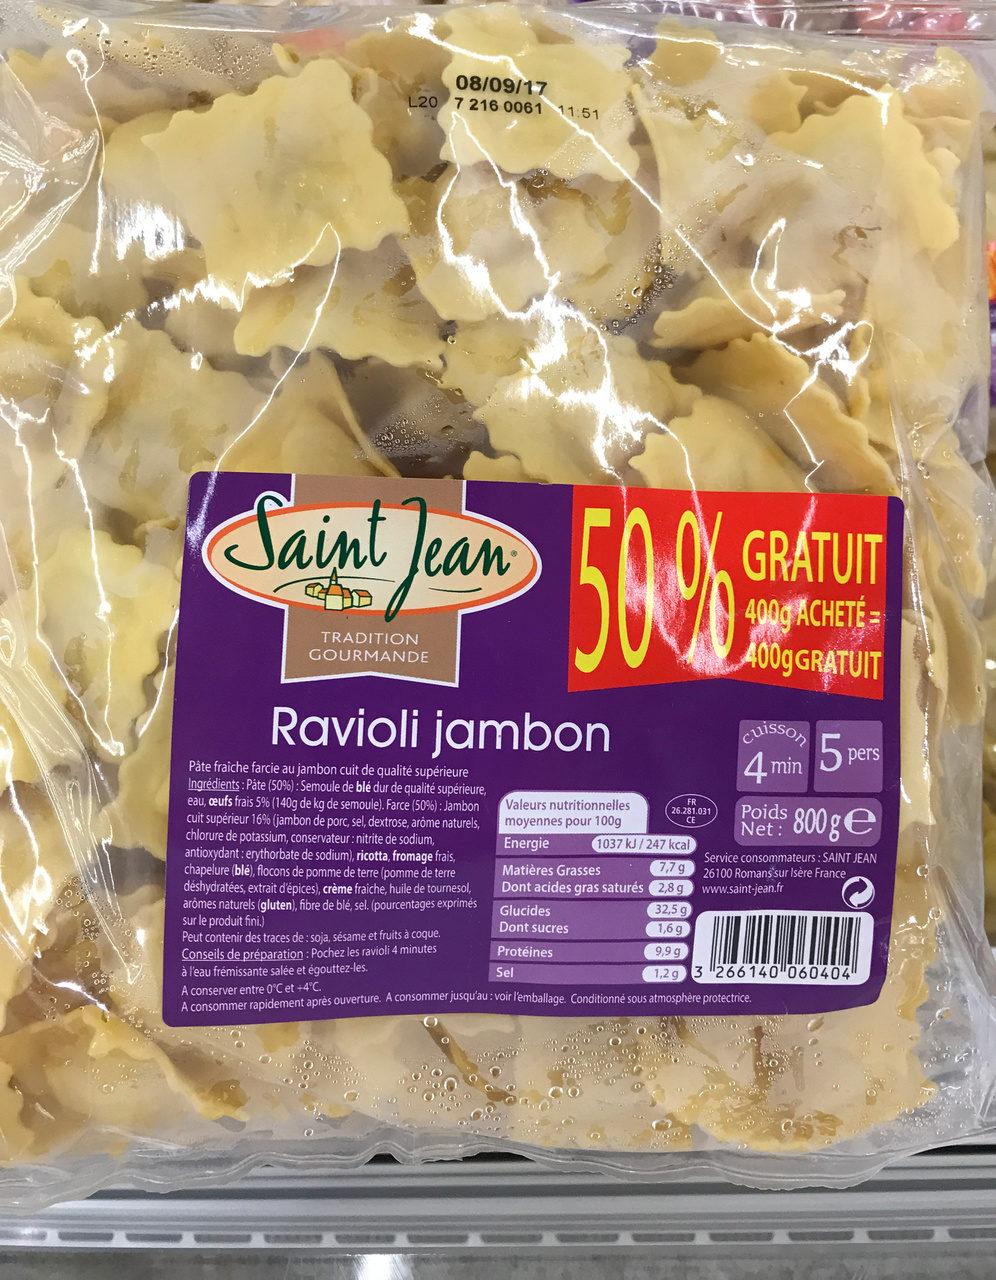 Ravioli jambon (50% gratuit) - Produit - fr